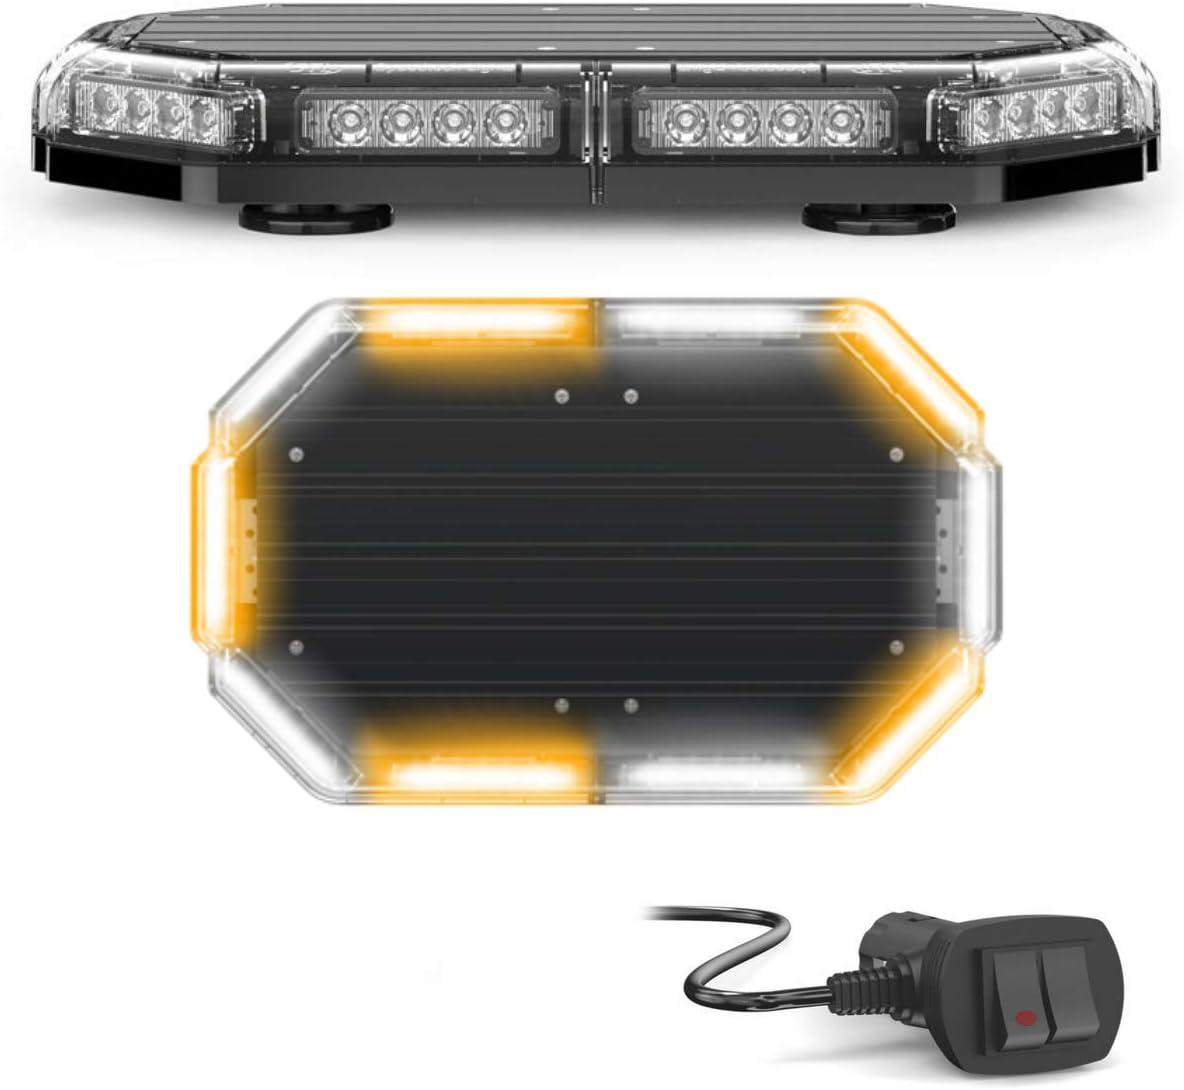 SpeedTech Lights K-Force Shipping included 18 Mini Light Watts Bar Strobe LED Finally popular brand 120